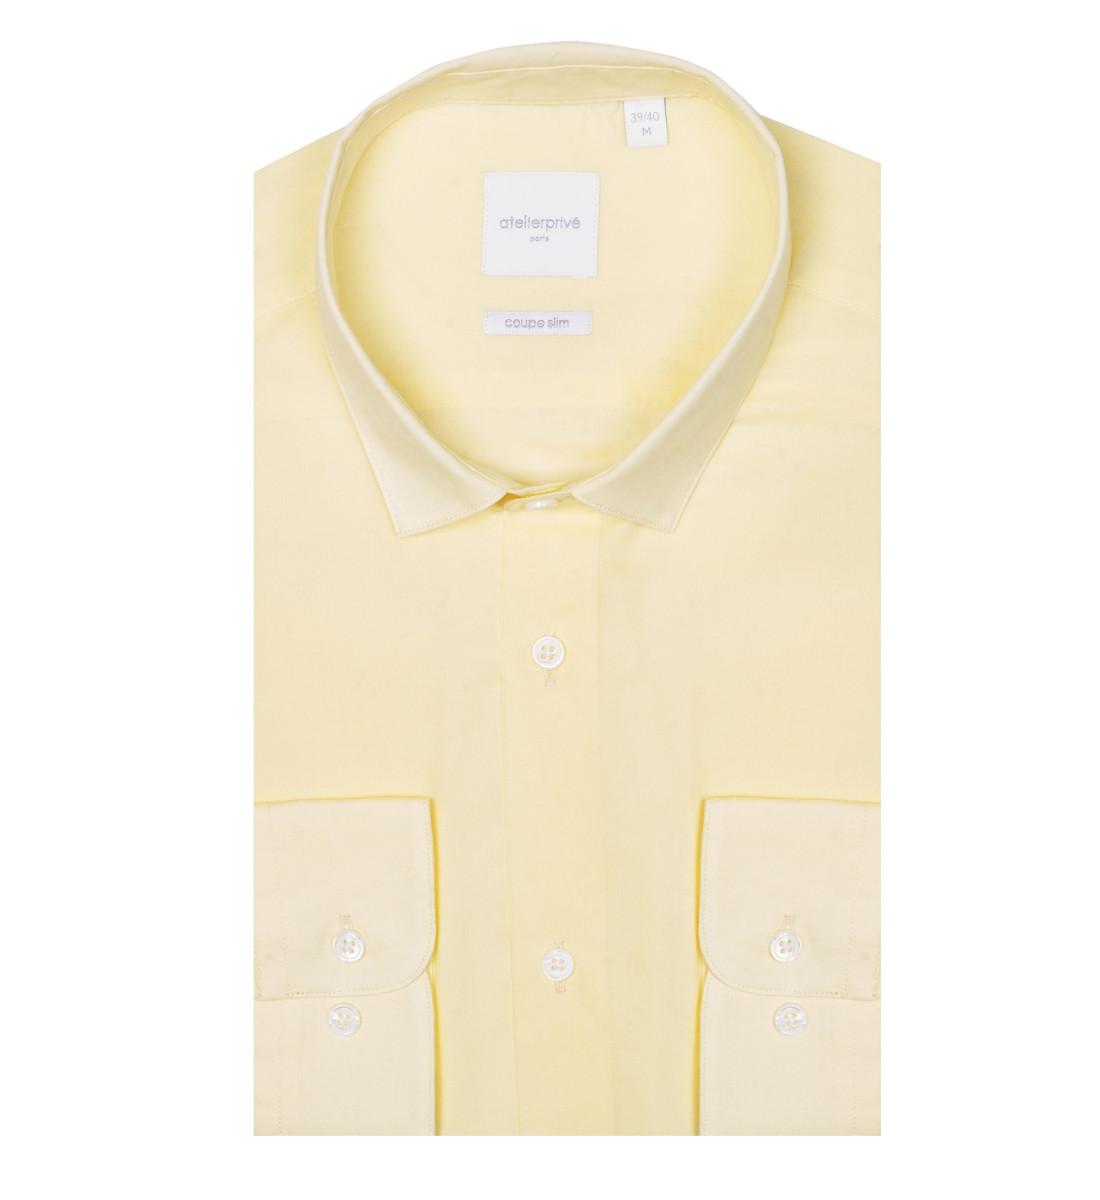 Chemise cintrée NYL jaune